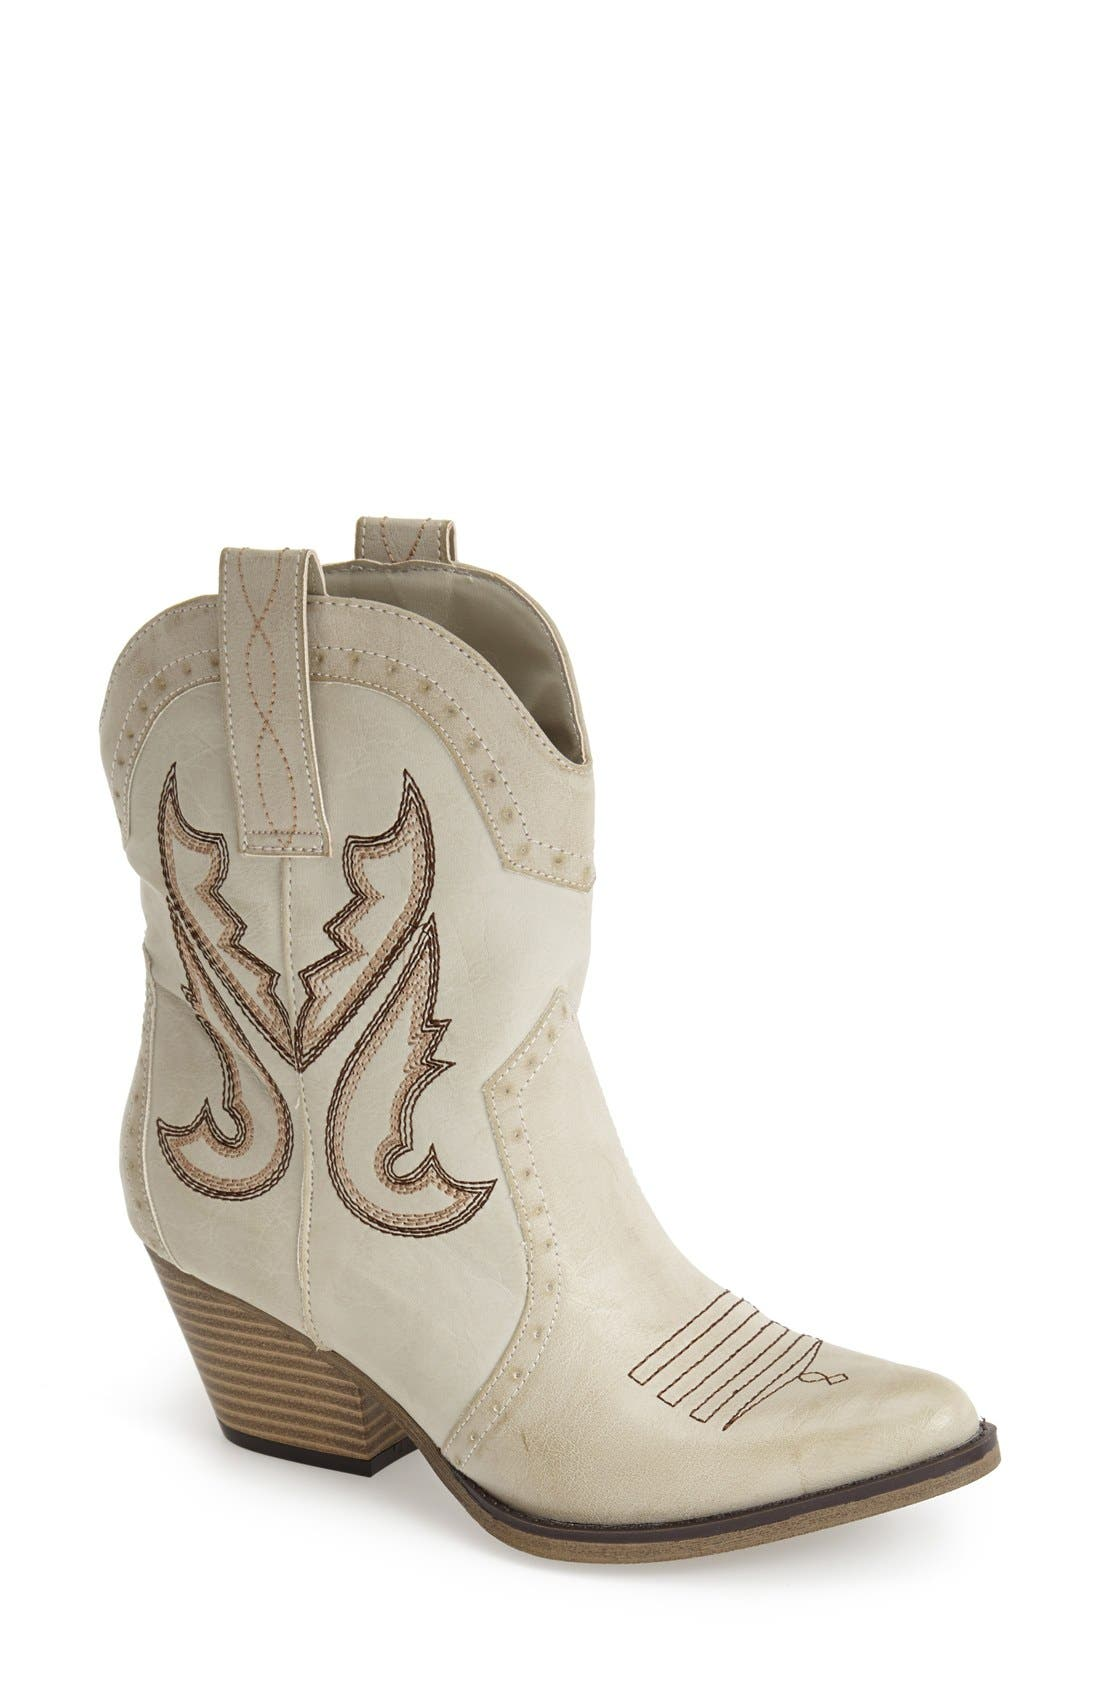 Alternate Image 1 Selected - MIA 'Horseback' Western Bootie (Women)